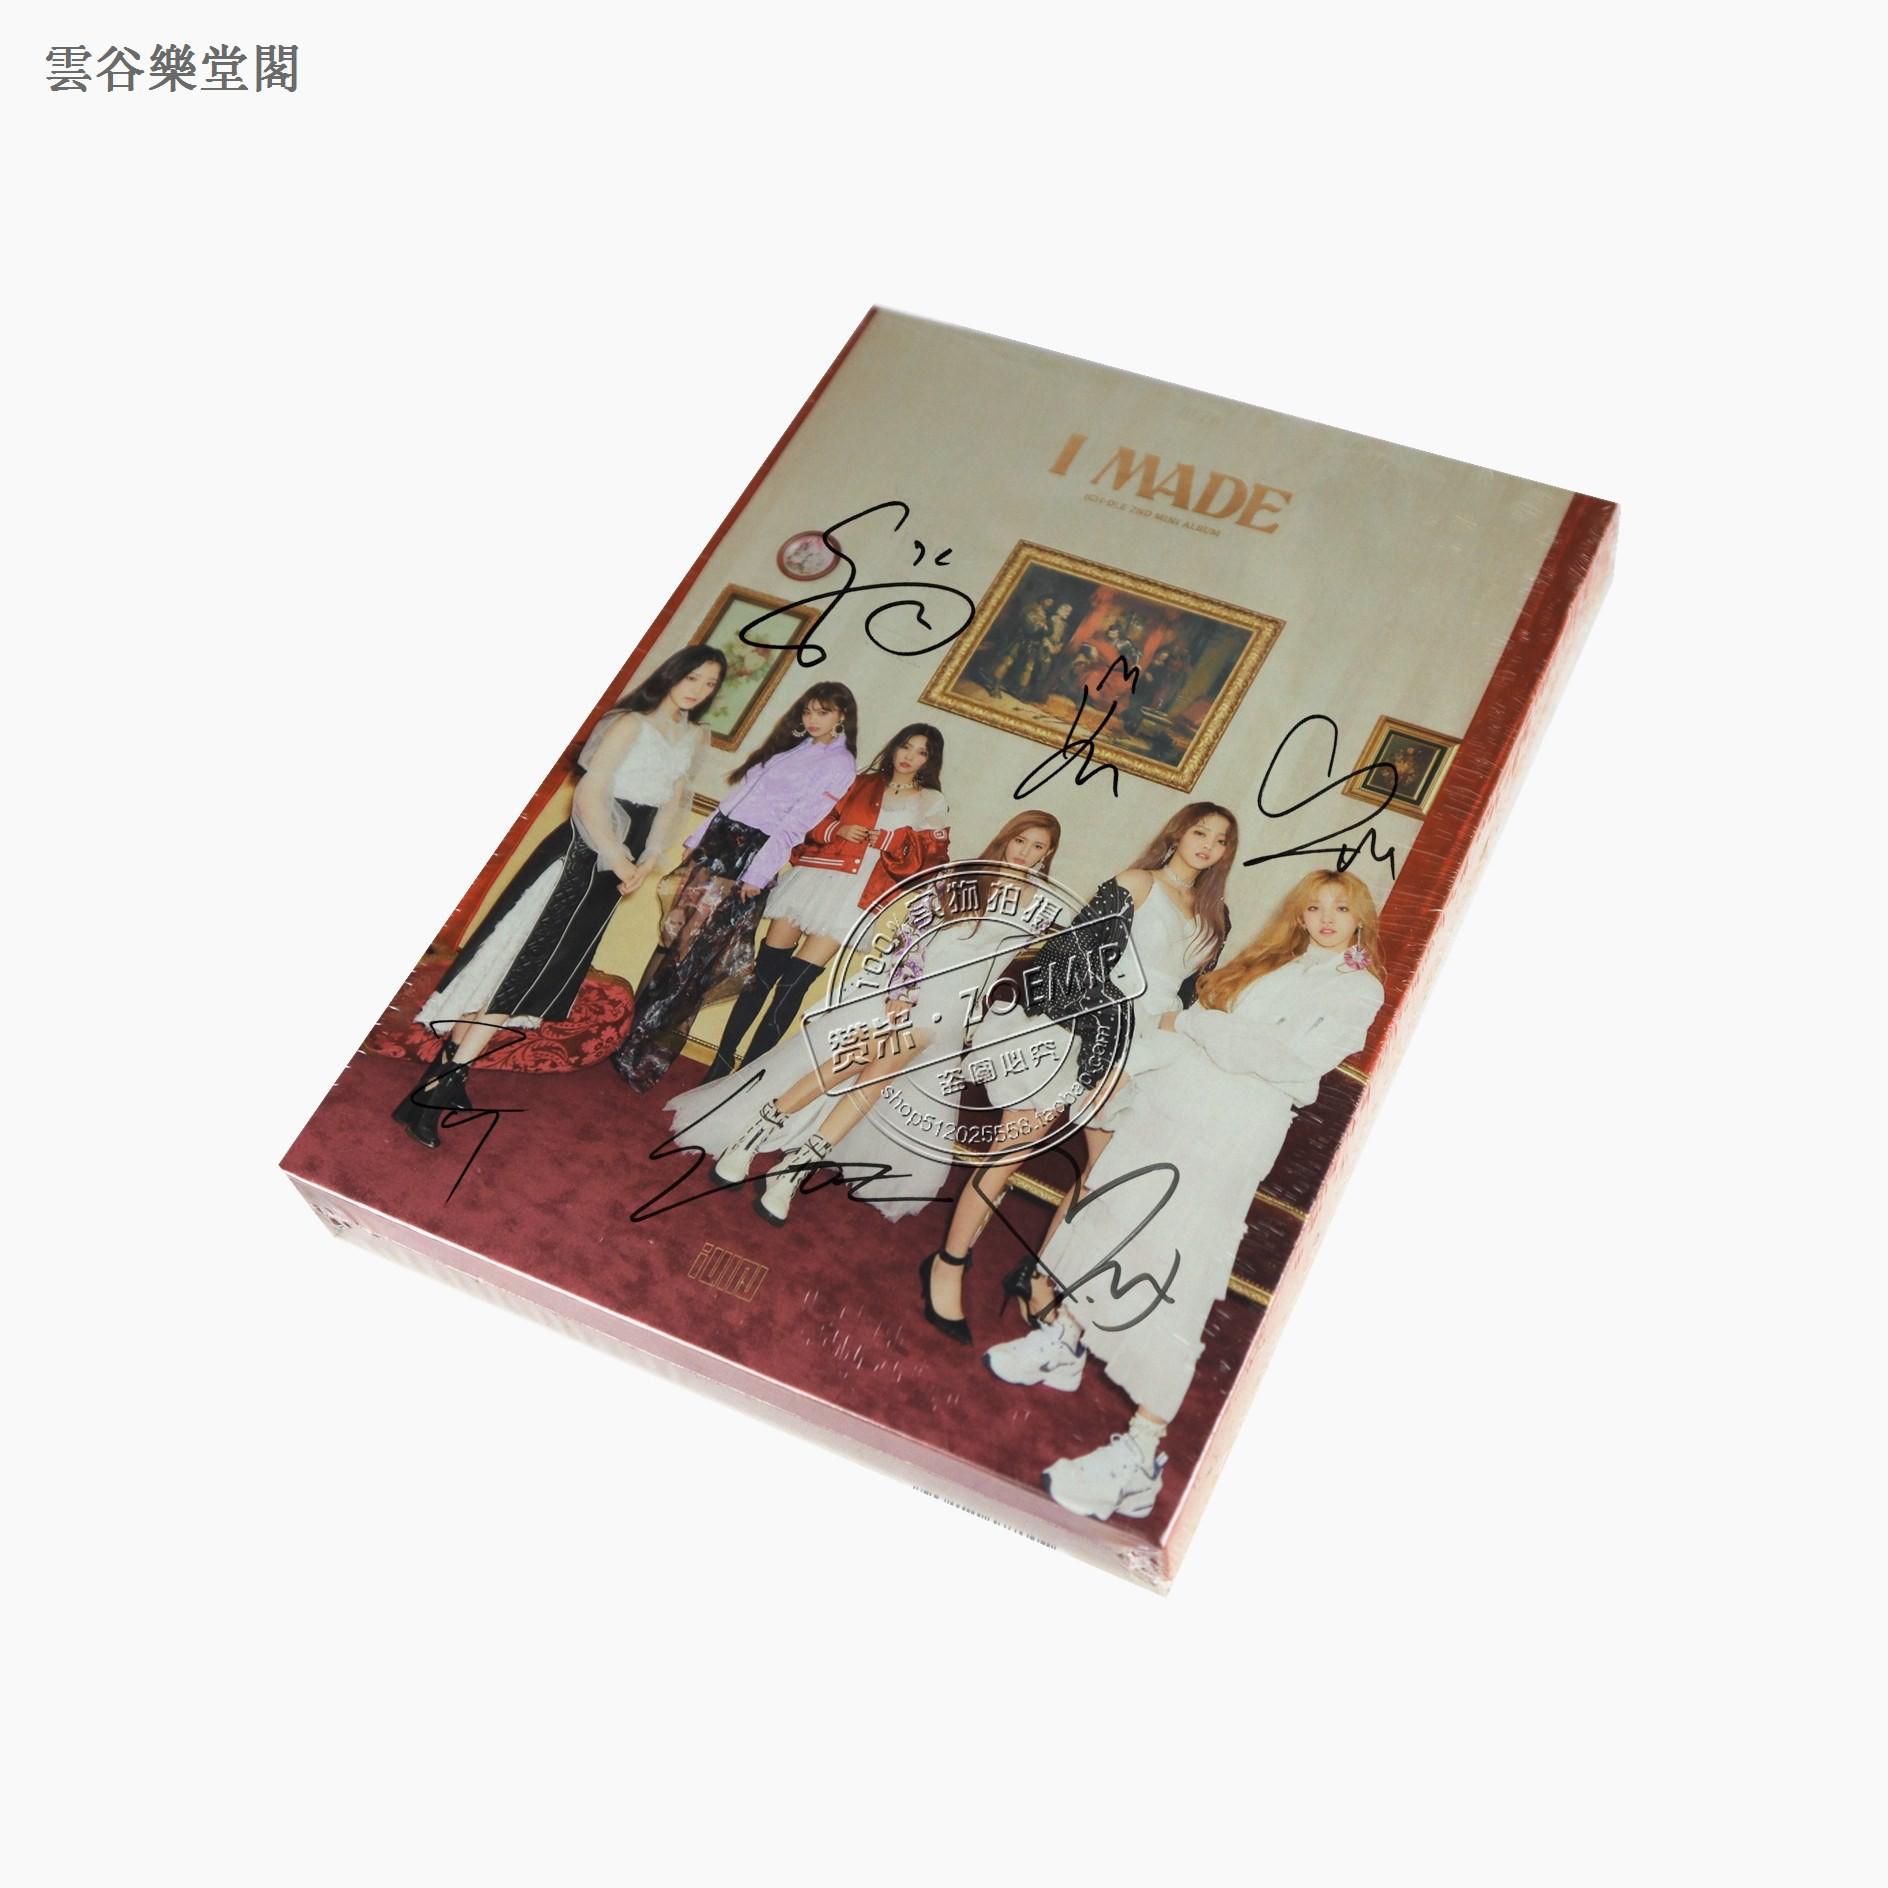 【精品收藏】【全新現貨】GIDLE (G)I-DLE 親筆簽名 I made 明星迷你寫真禮盒